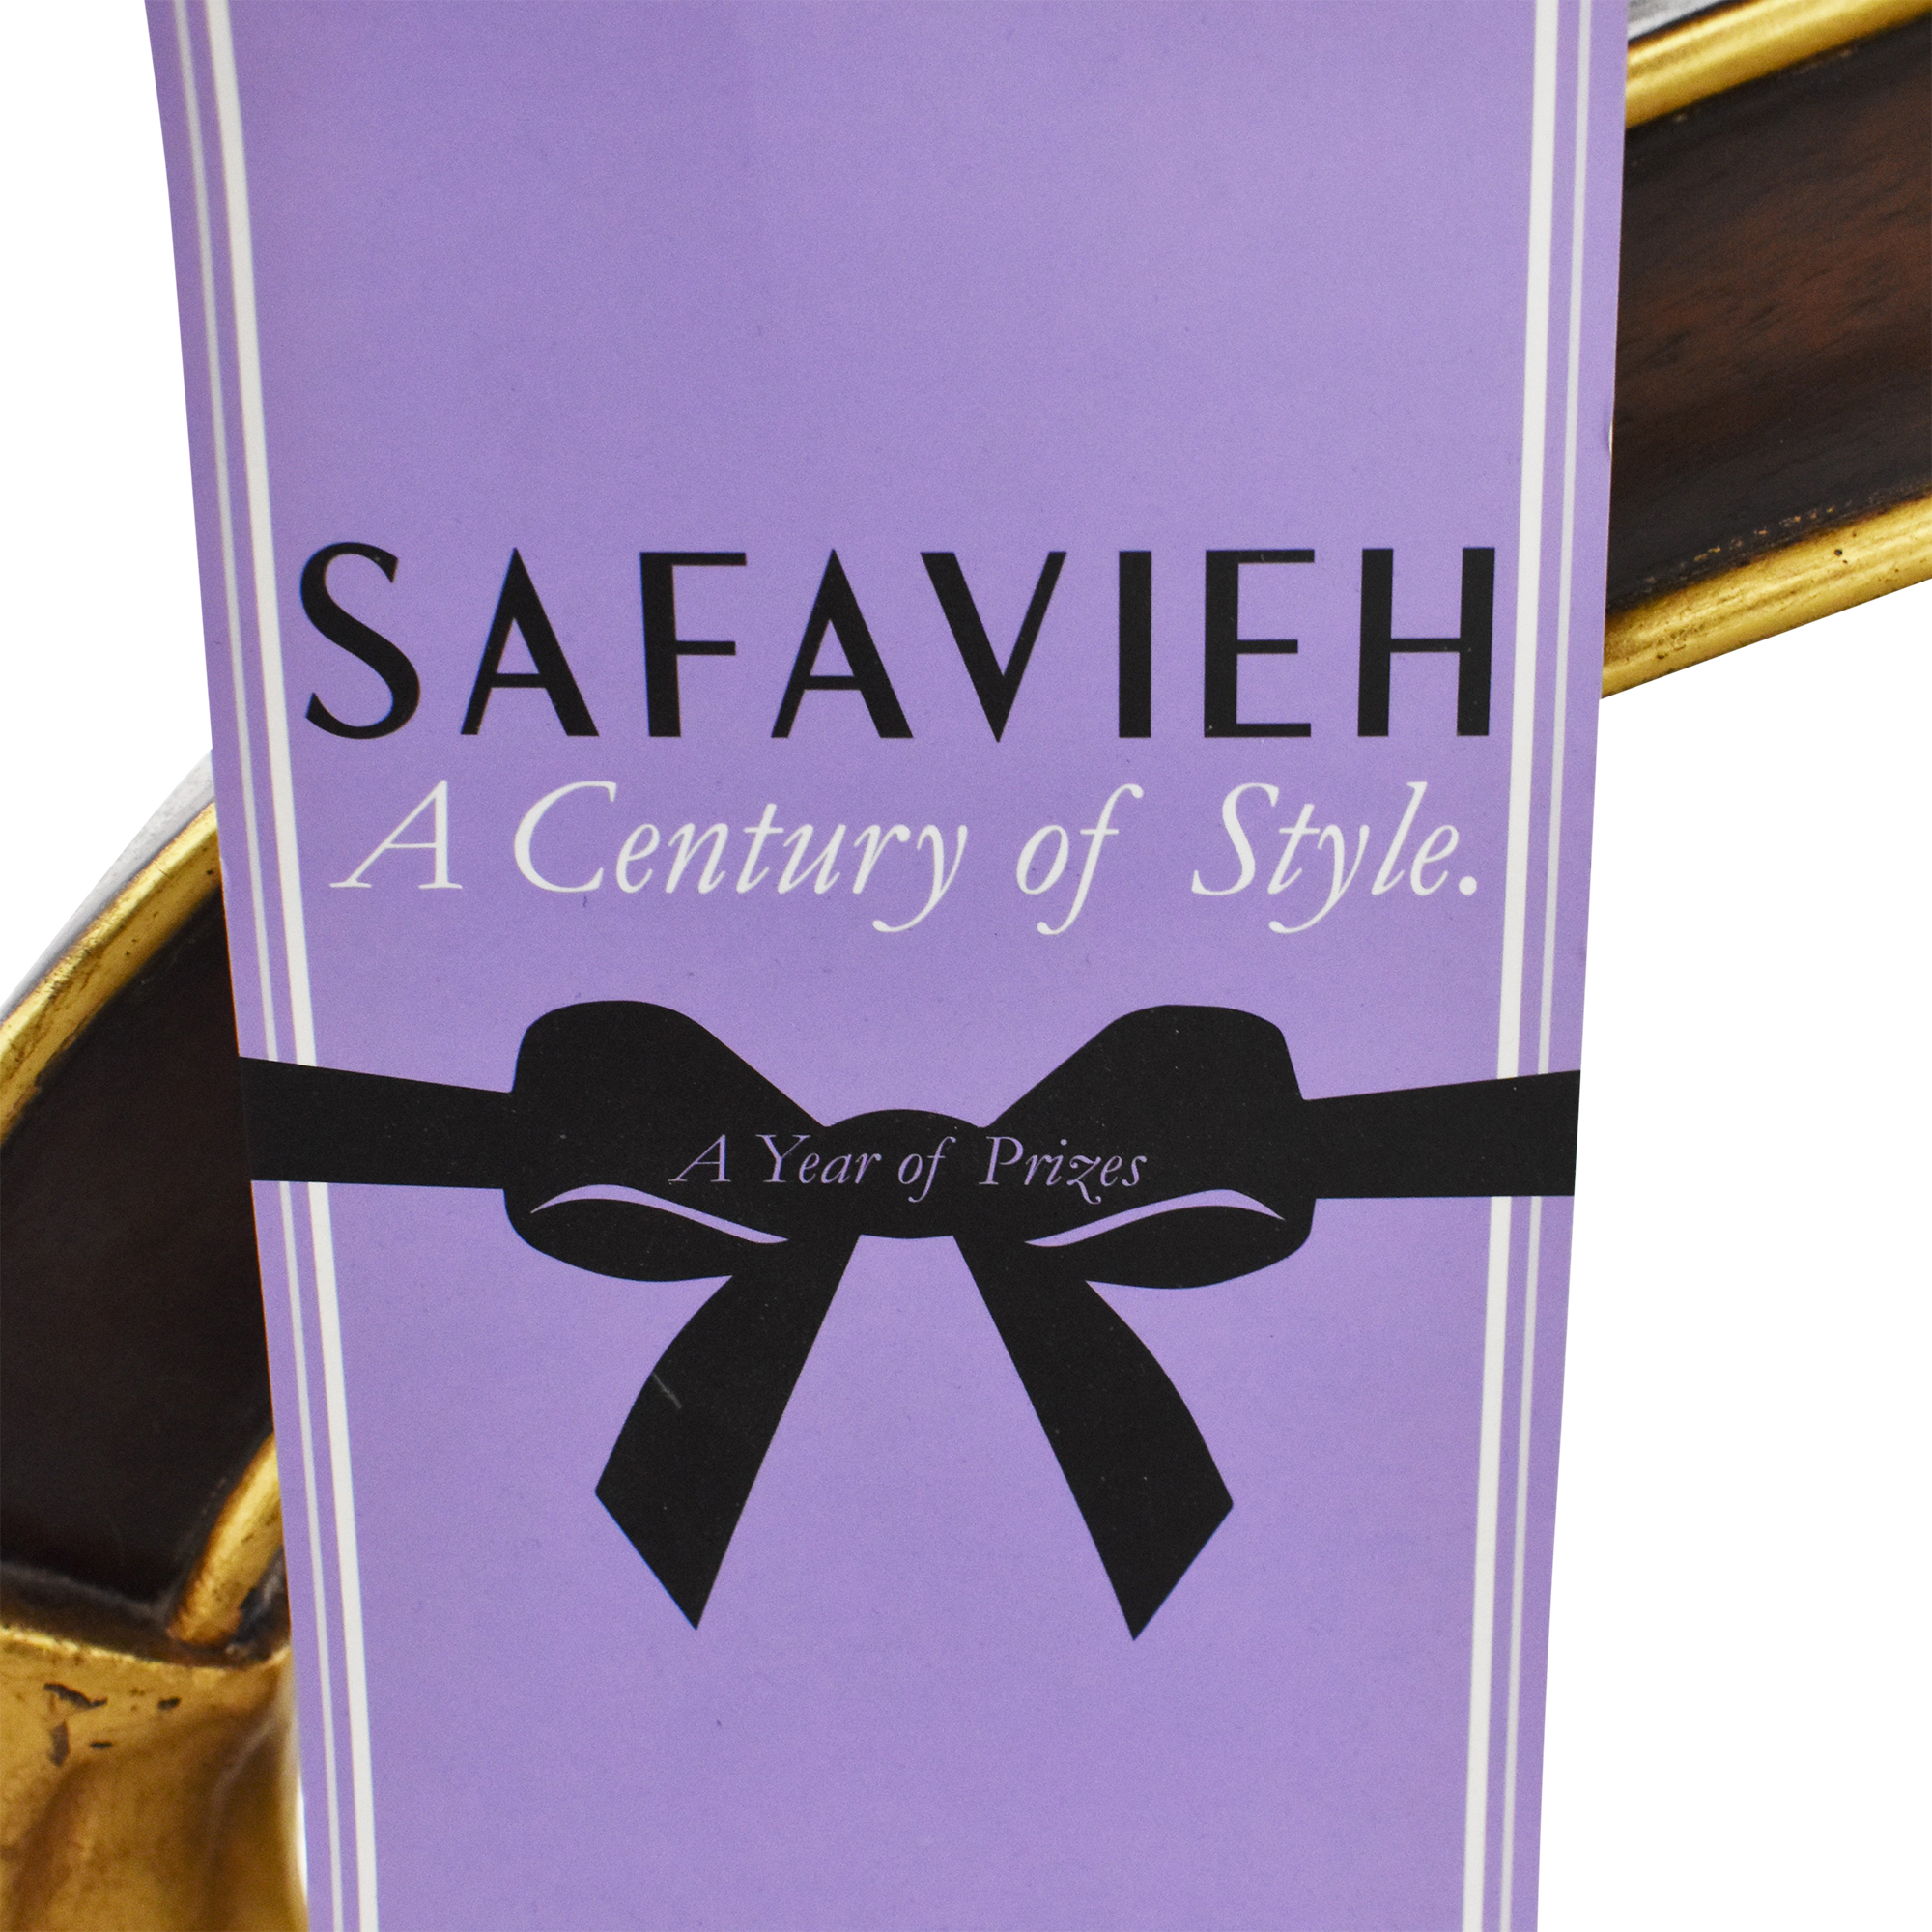 shop Safavieh Safavieh Couture Ermin Tufted Club Ottoman online